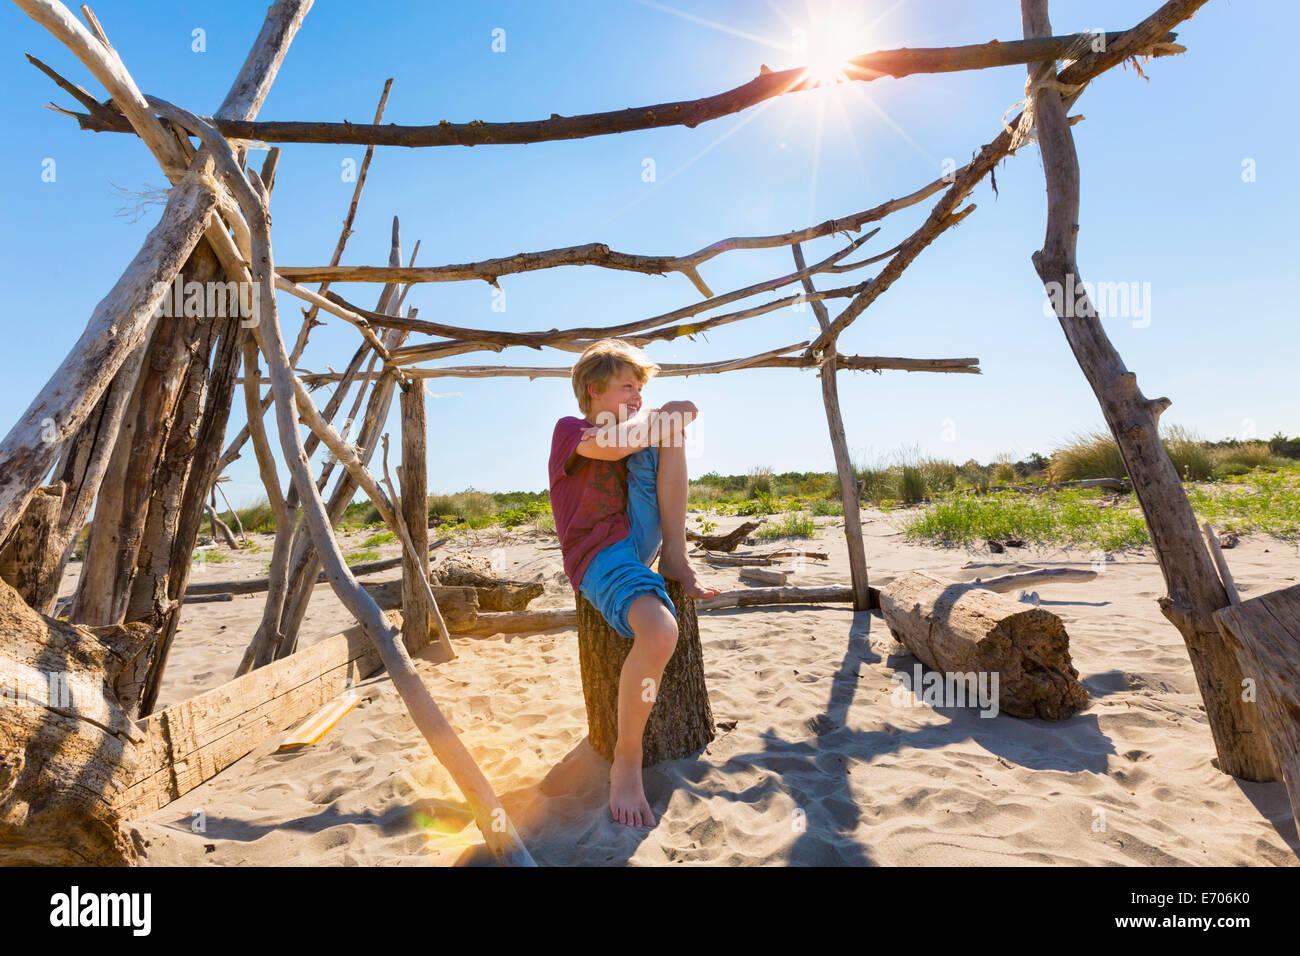 Boy making a break in driftwood shelter, Caleri Beach, Veneto, Italy - Stock Image